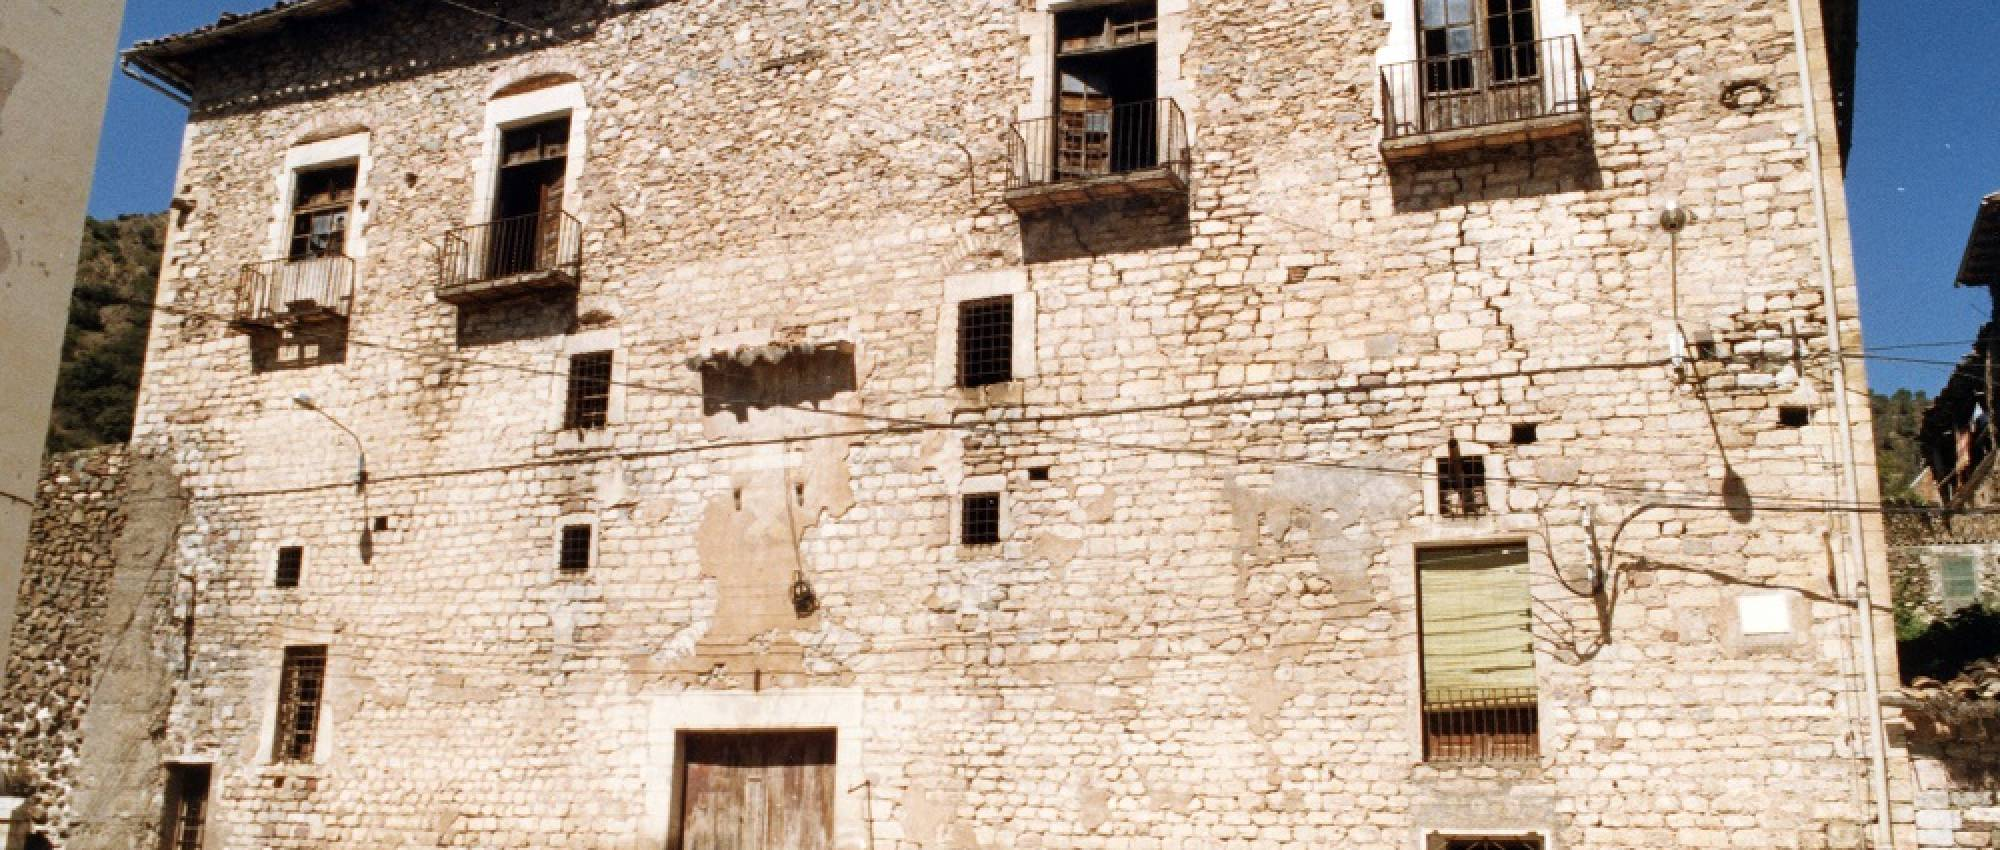 Vista exterior de l'alfolí (Jordi Contijoch)